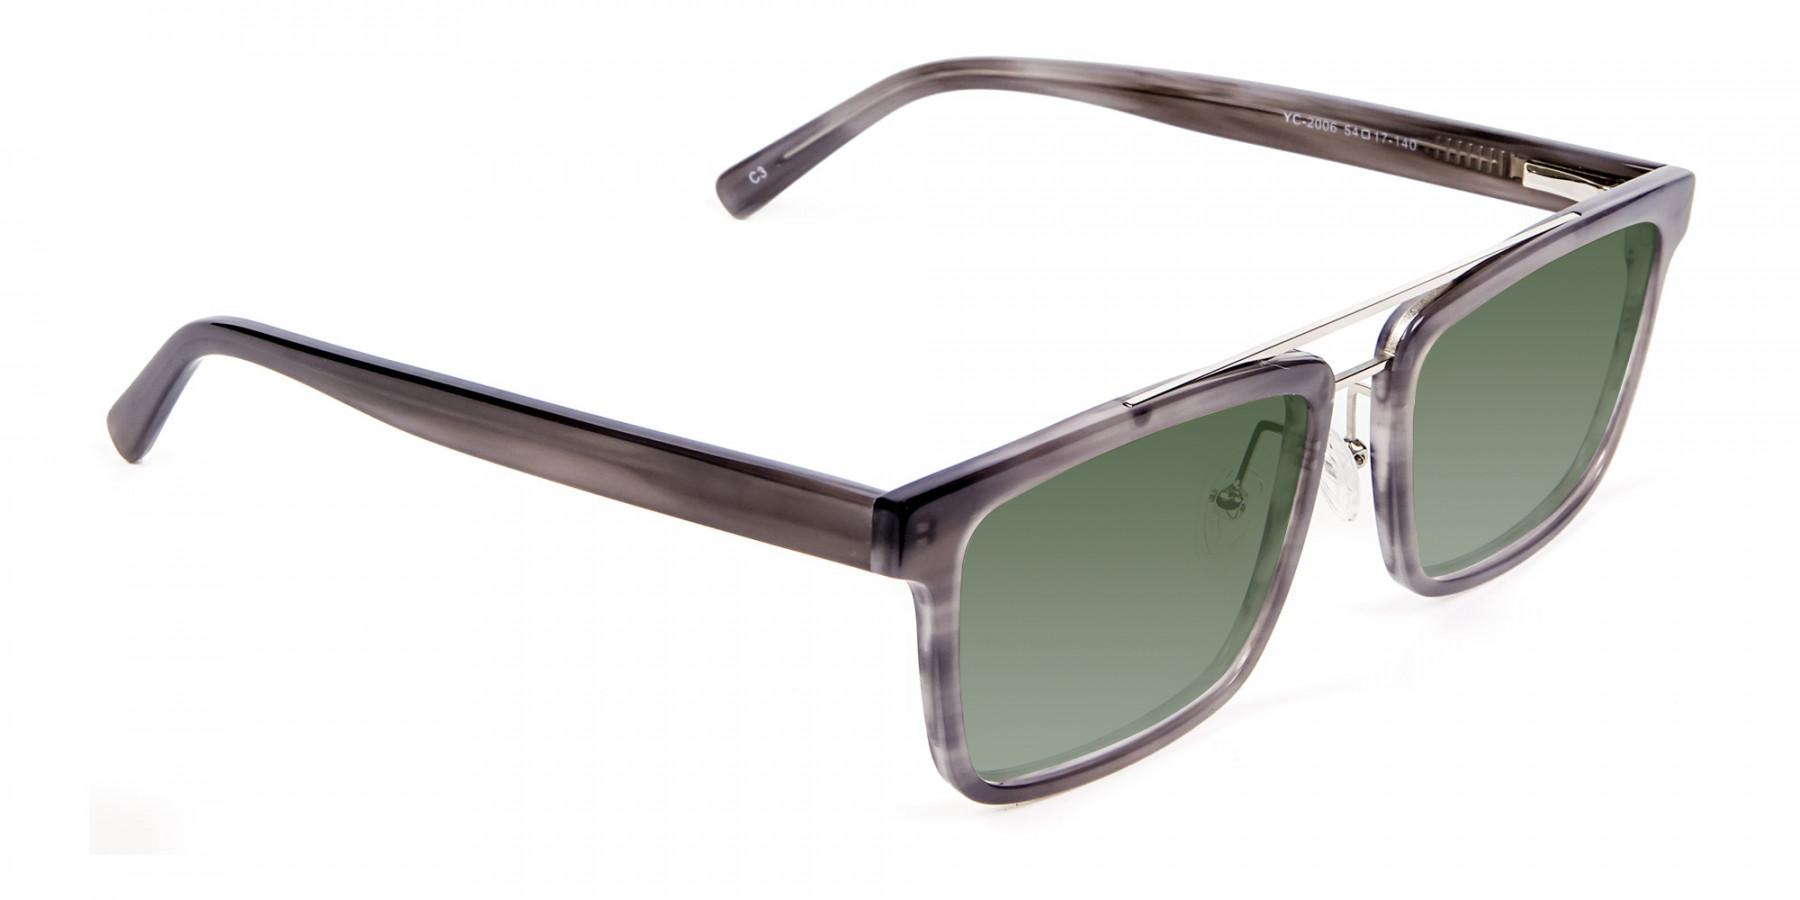 Unisex Dark Green Rectangular Sunglasses  Specscart-3